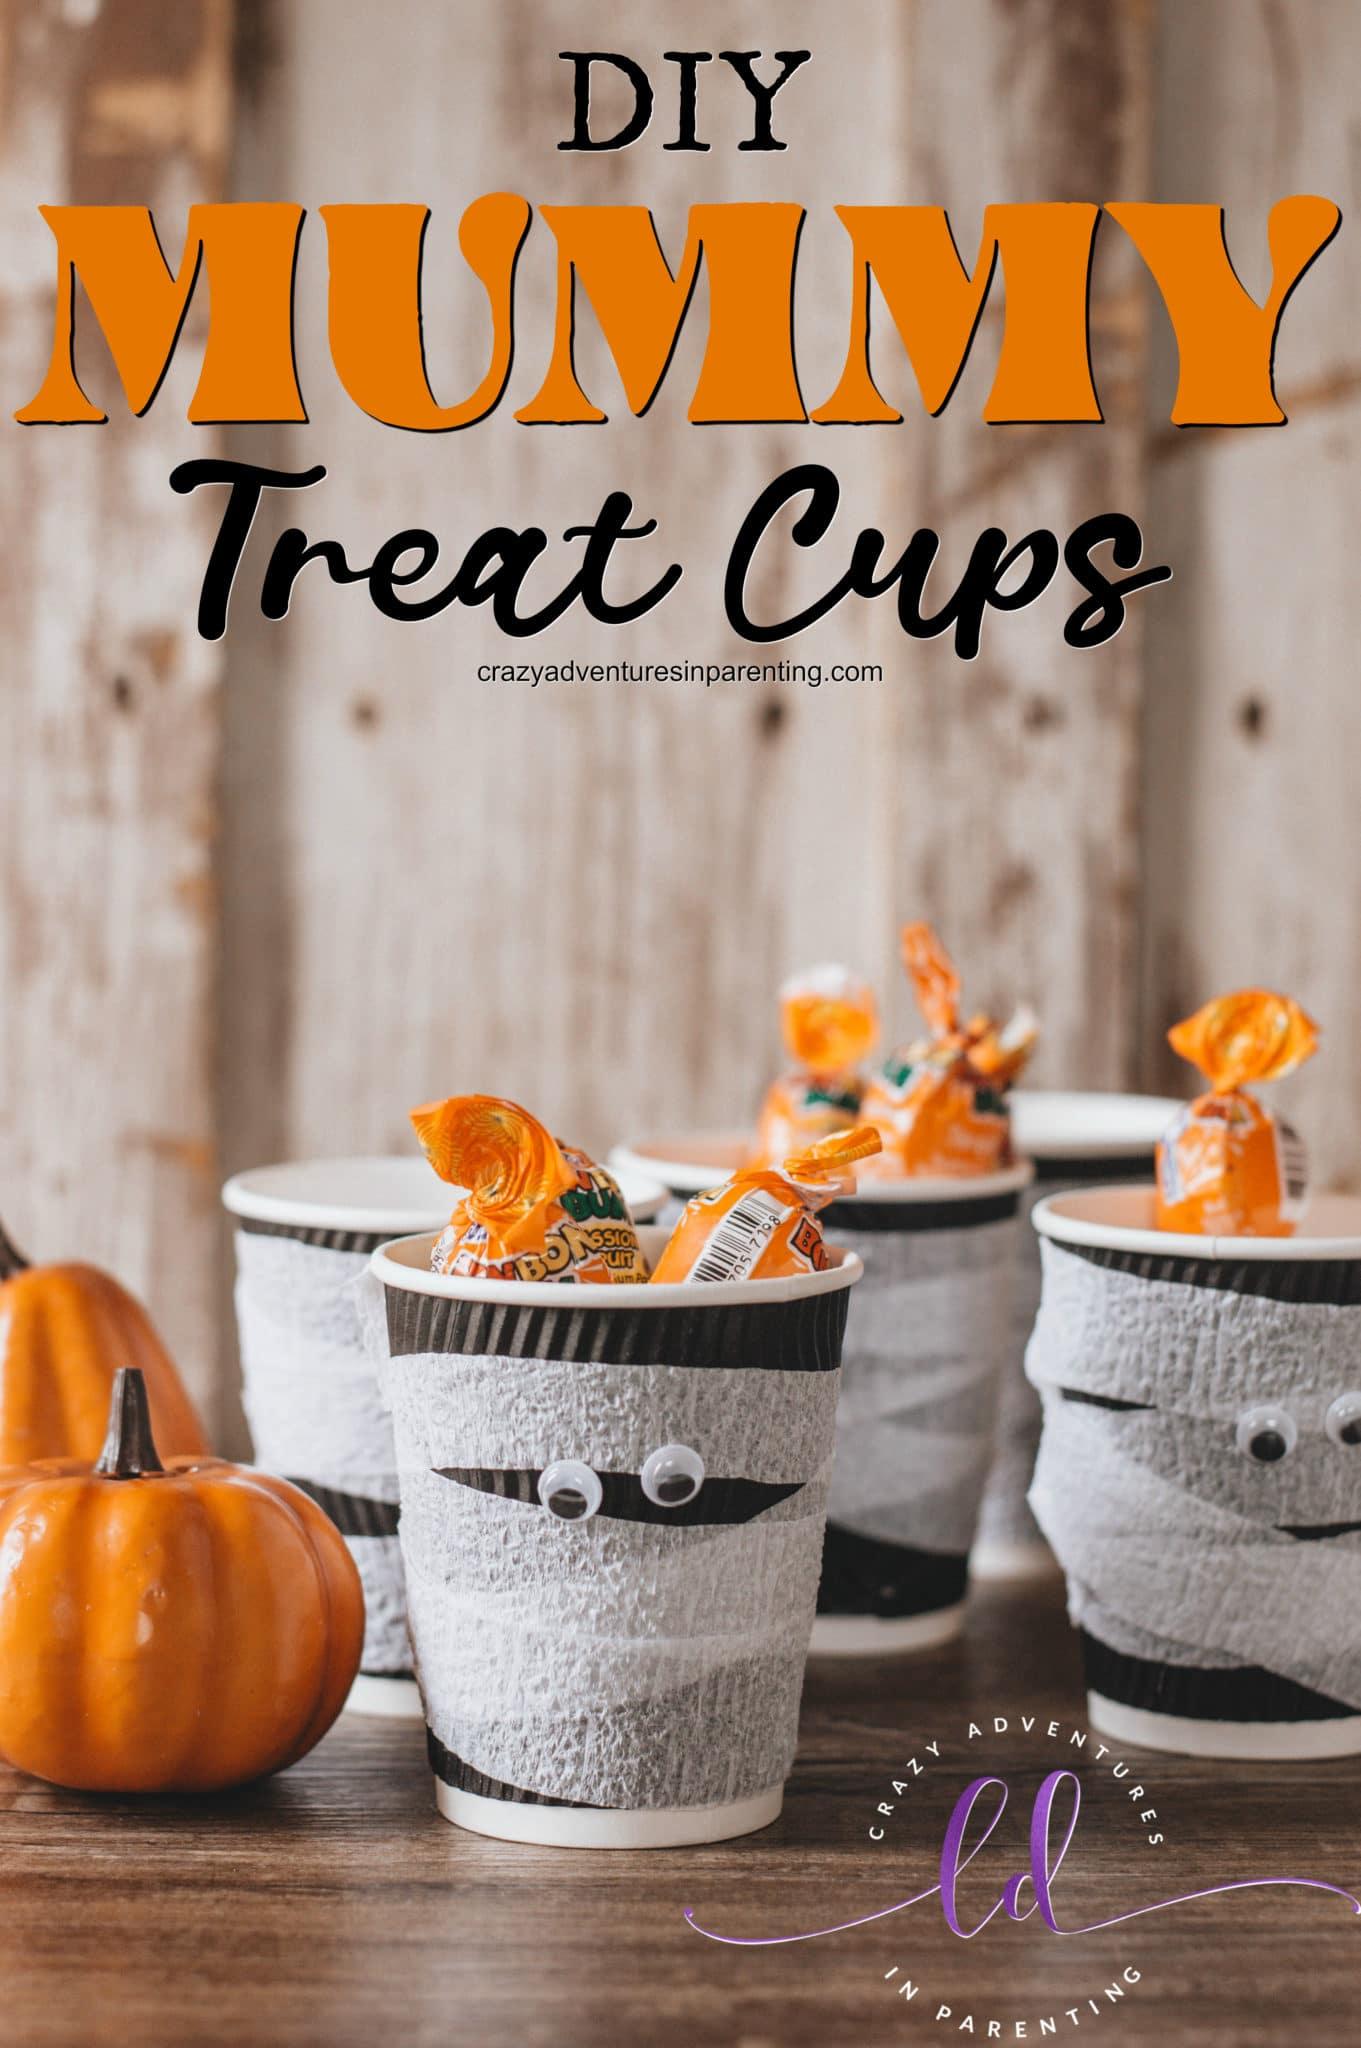 DIY Mummy Treat Cups for Halloween